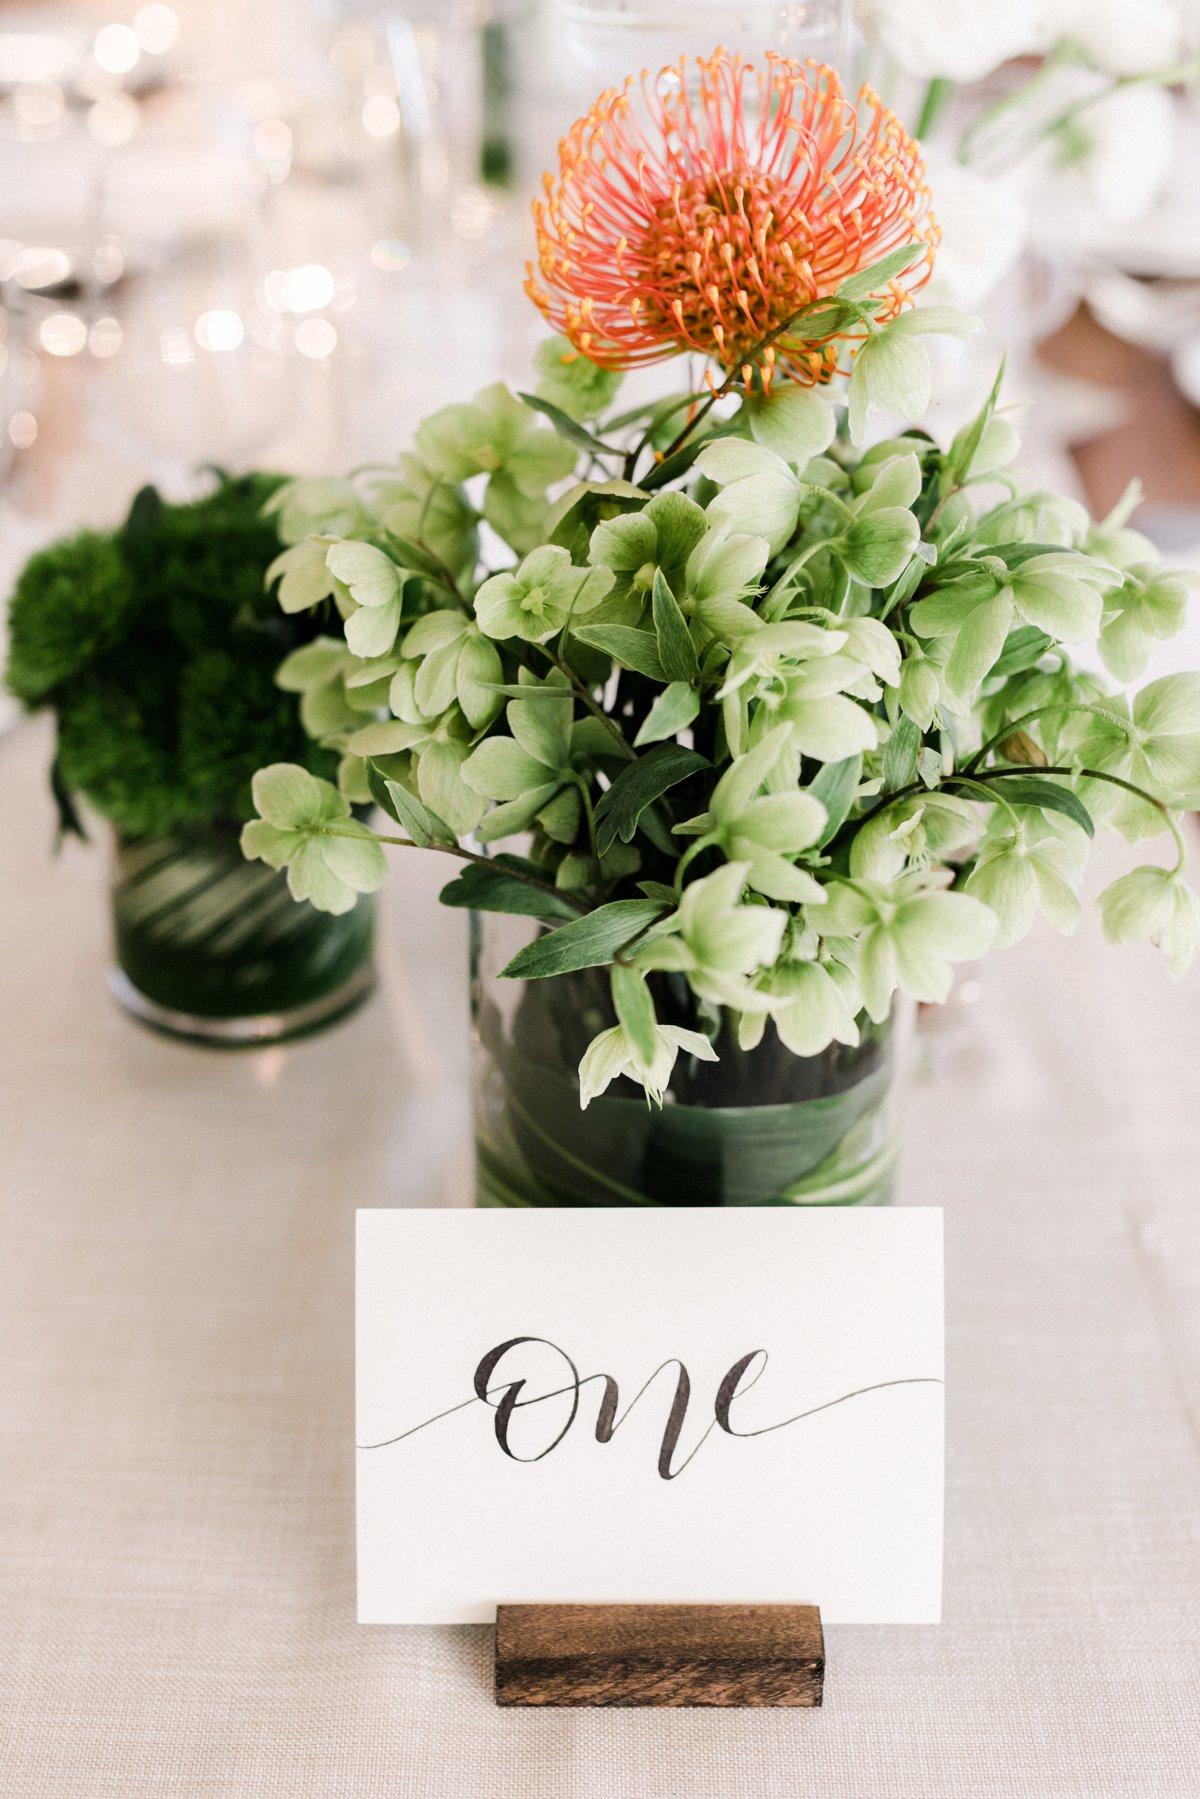 hydrangea and pincushion centerpieces - photo by Anna Delores http://ruffledblog.com/chic-modern-wedding-at-four-seasons-santa-barbara